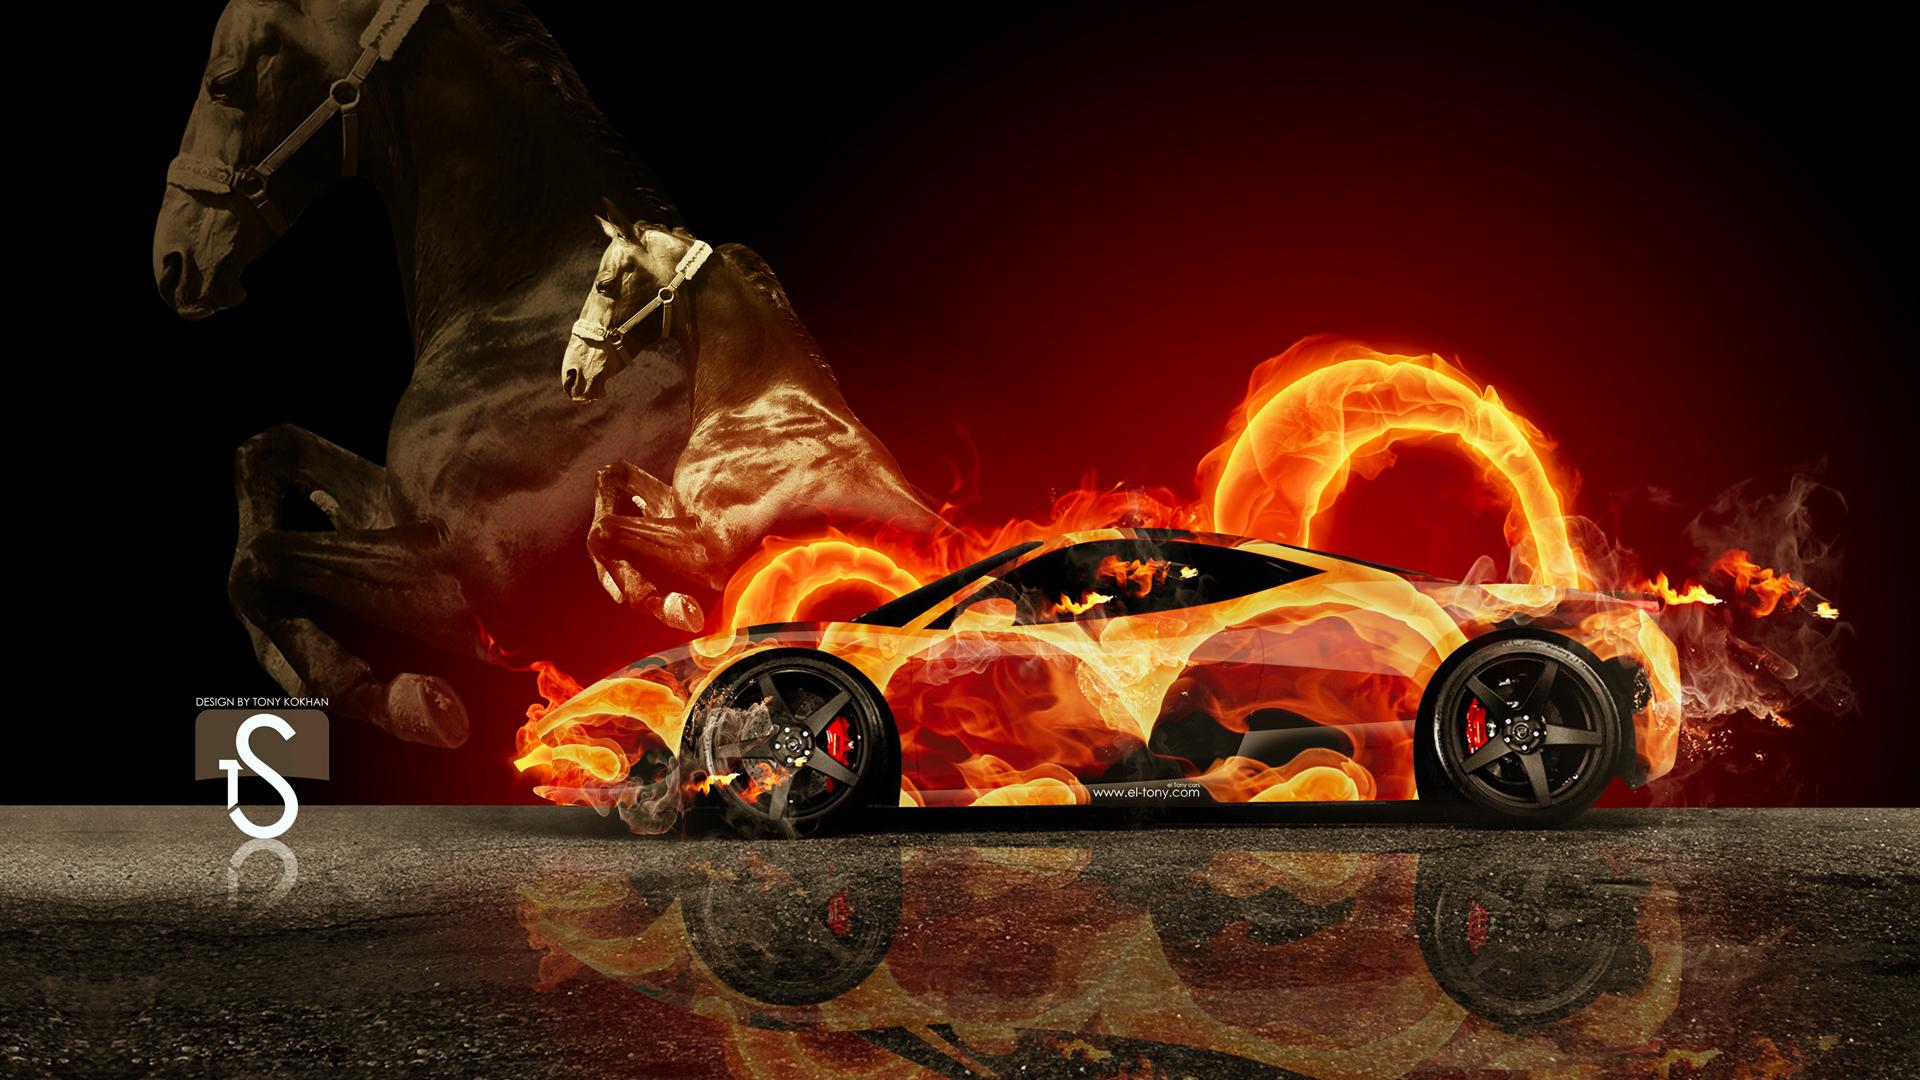 Ferrari Italia Fire By Sampatel On DeviantArt - Cool cars on fire